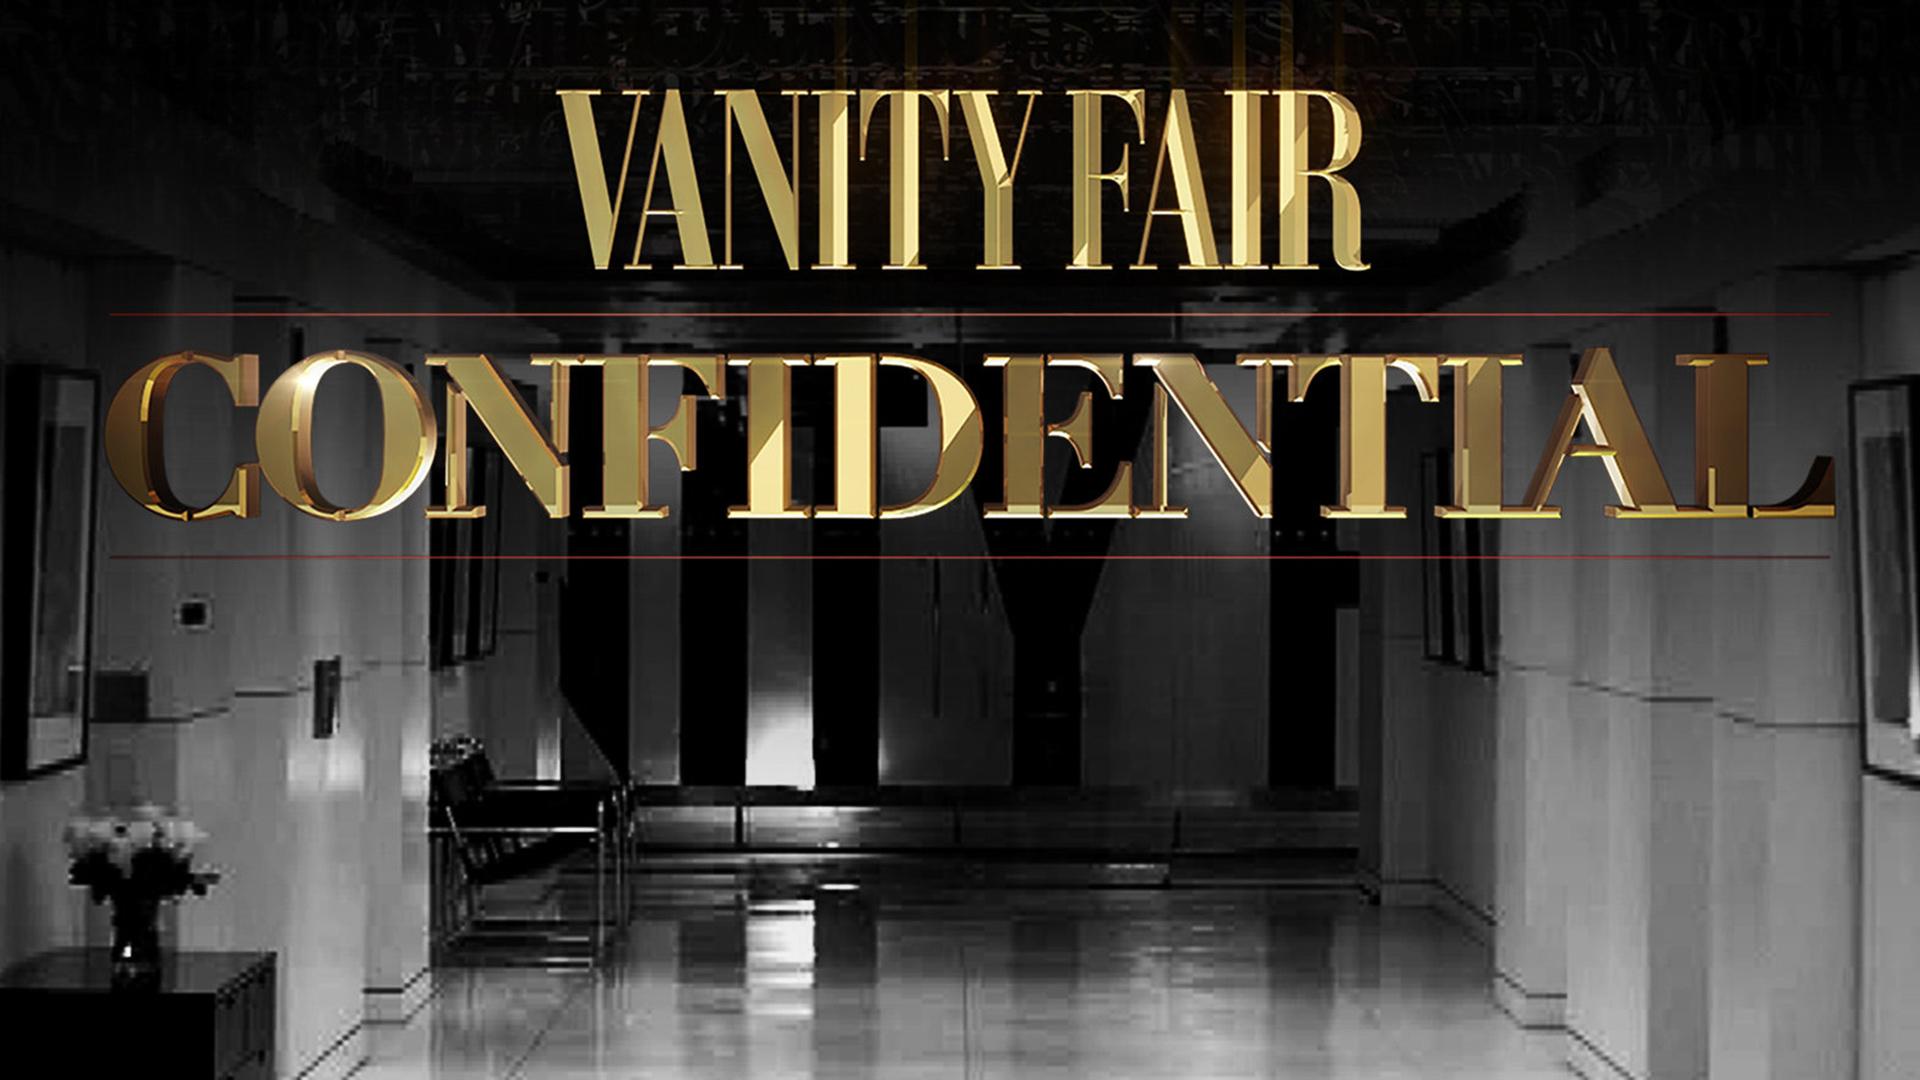 Vanity Fair Confidential Season 1